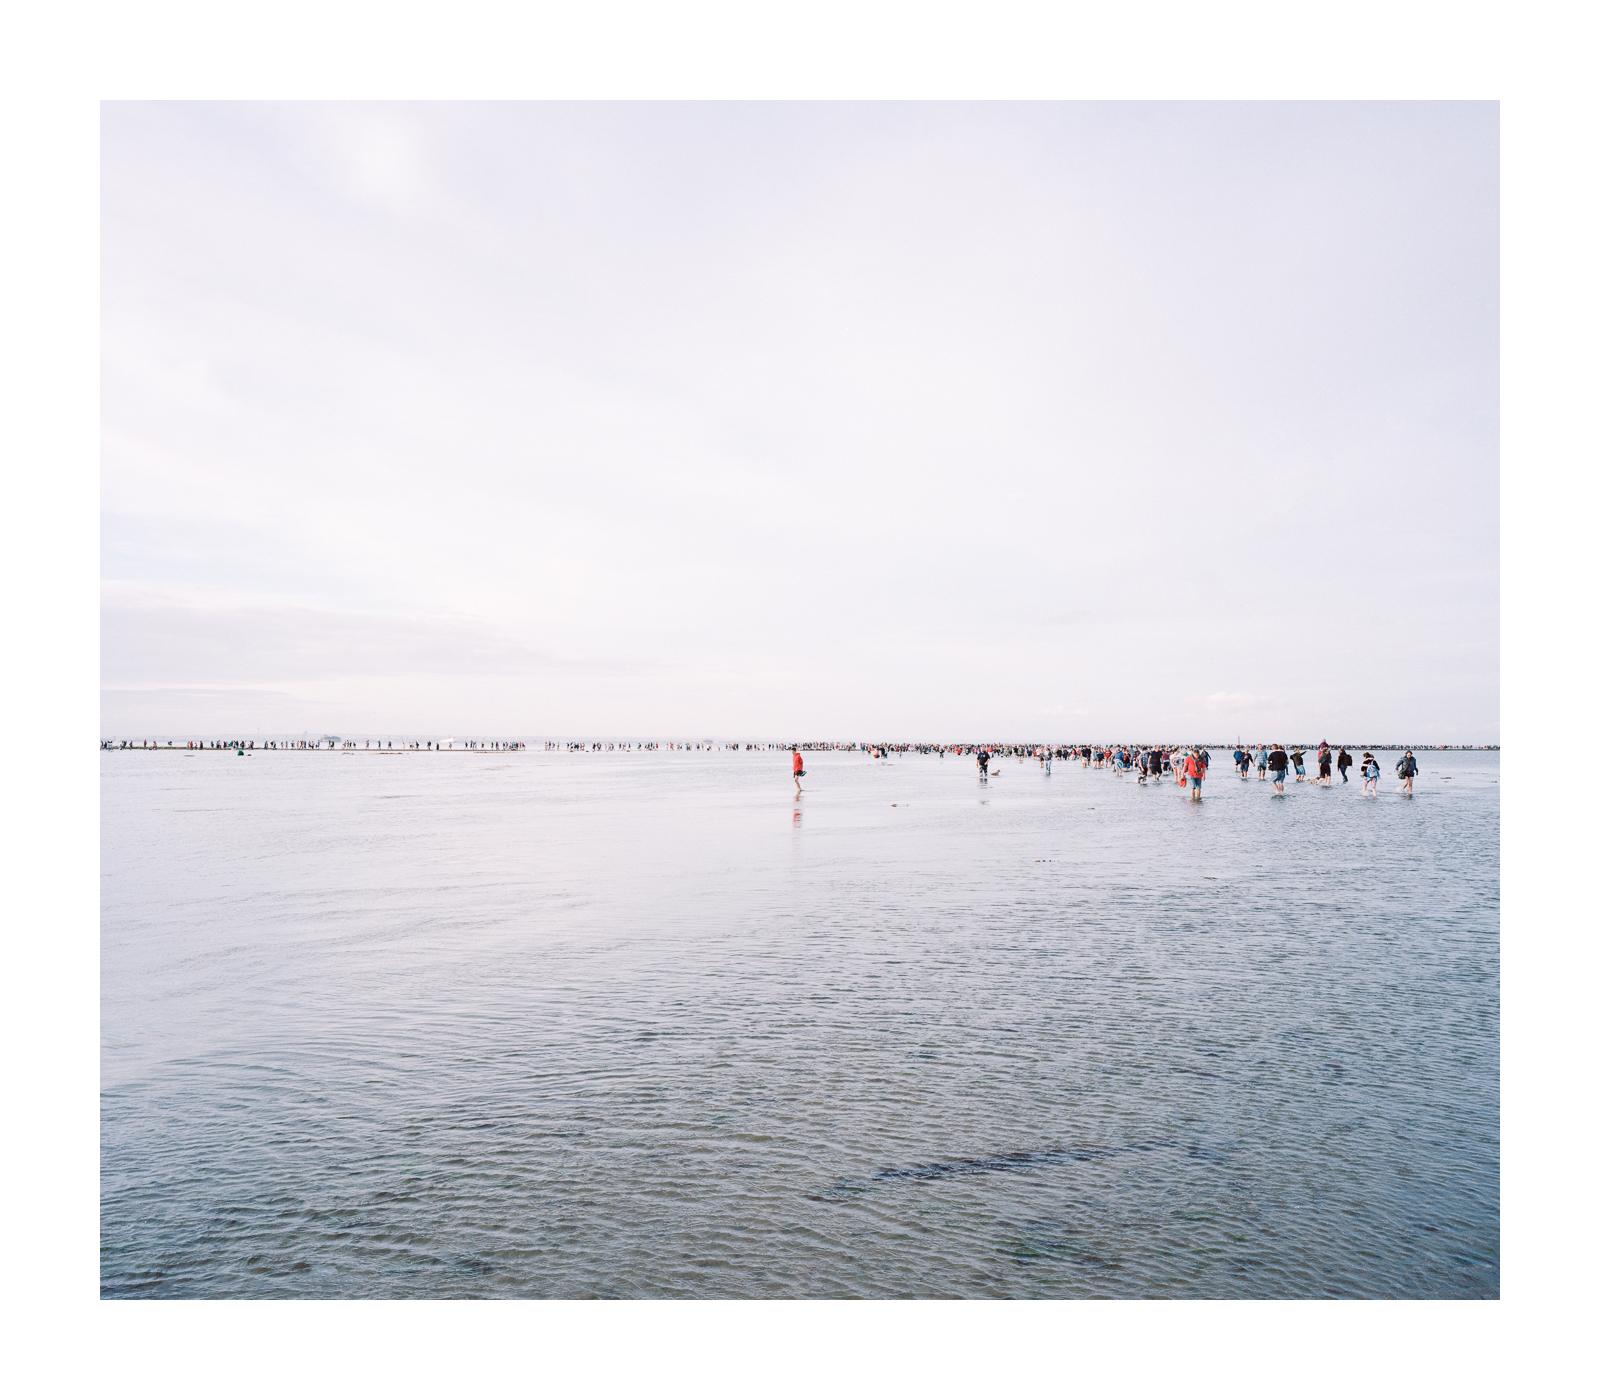 Alexander Mourant - Photographs-26.jpg